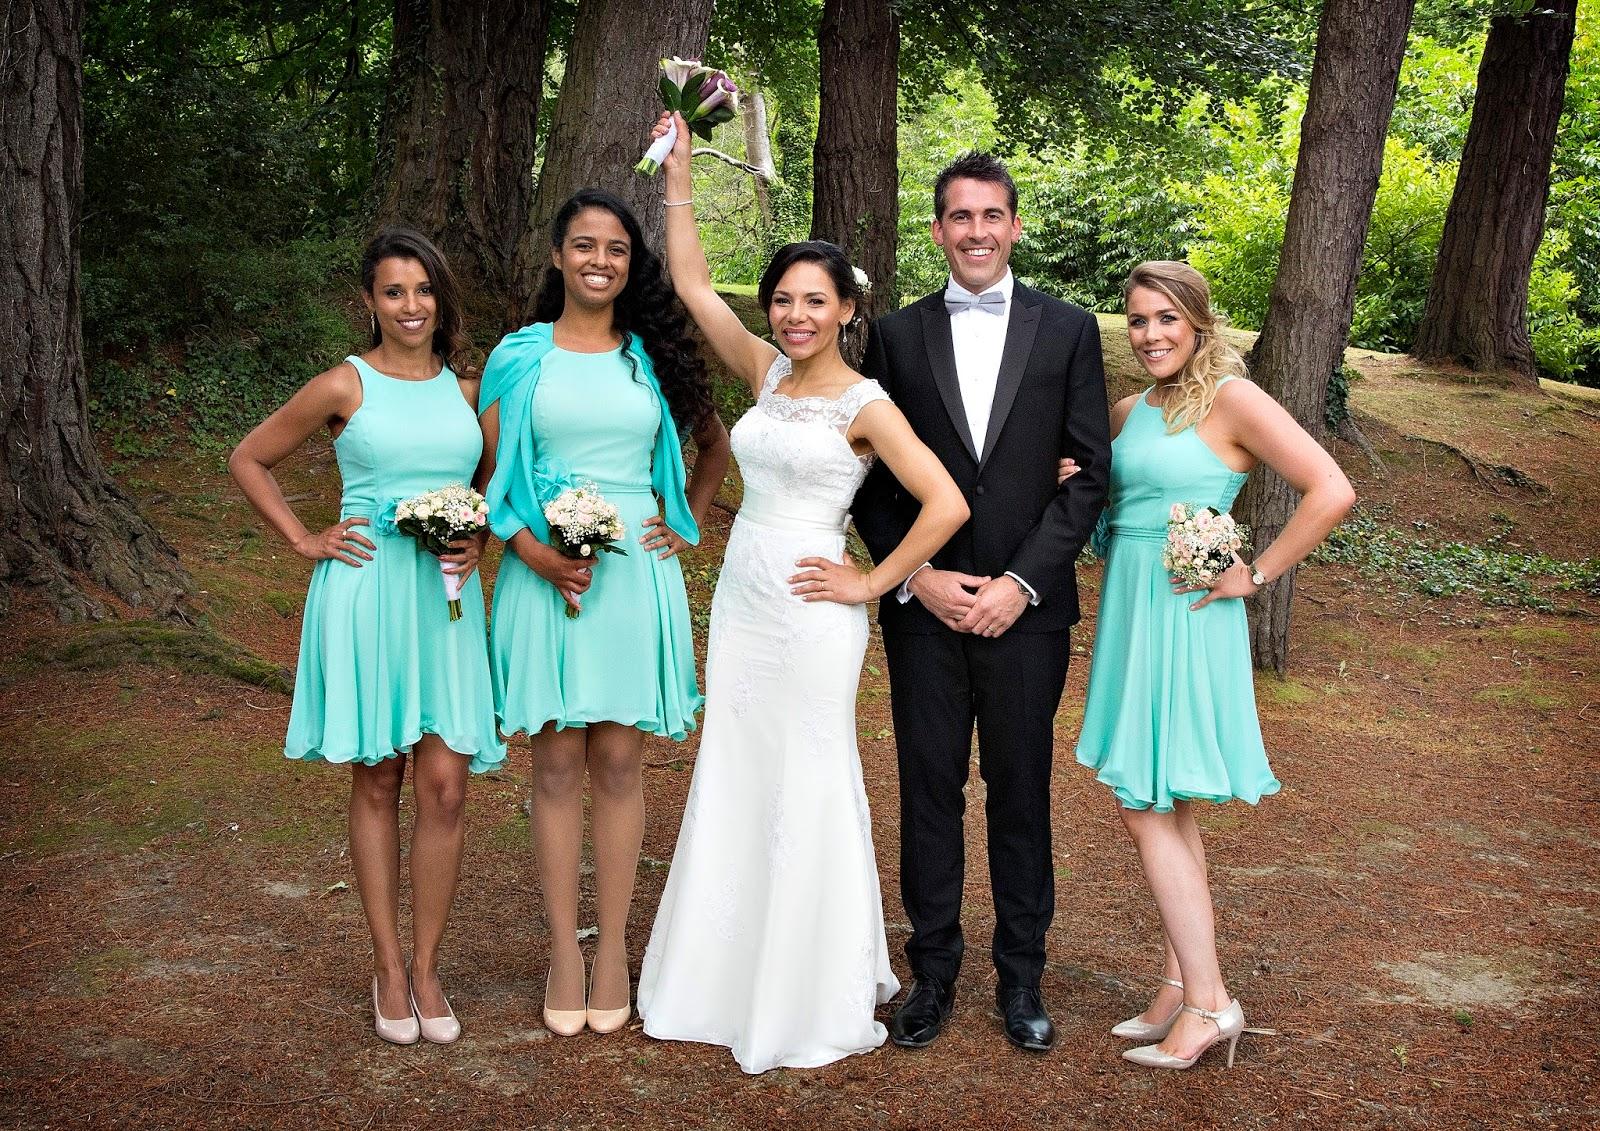 weddings at powerscourt house